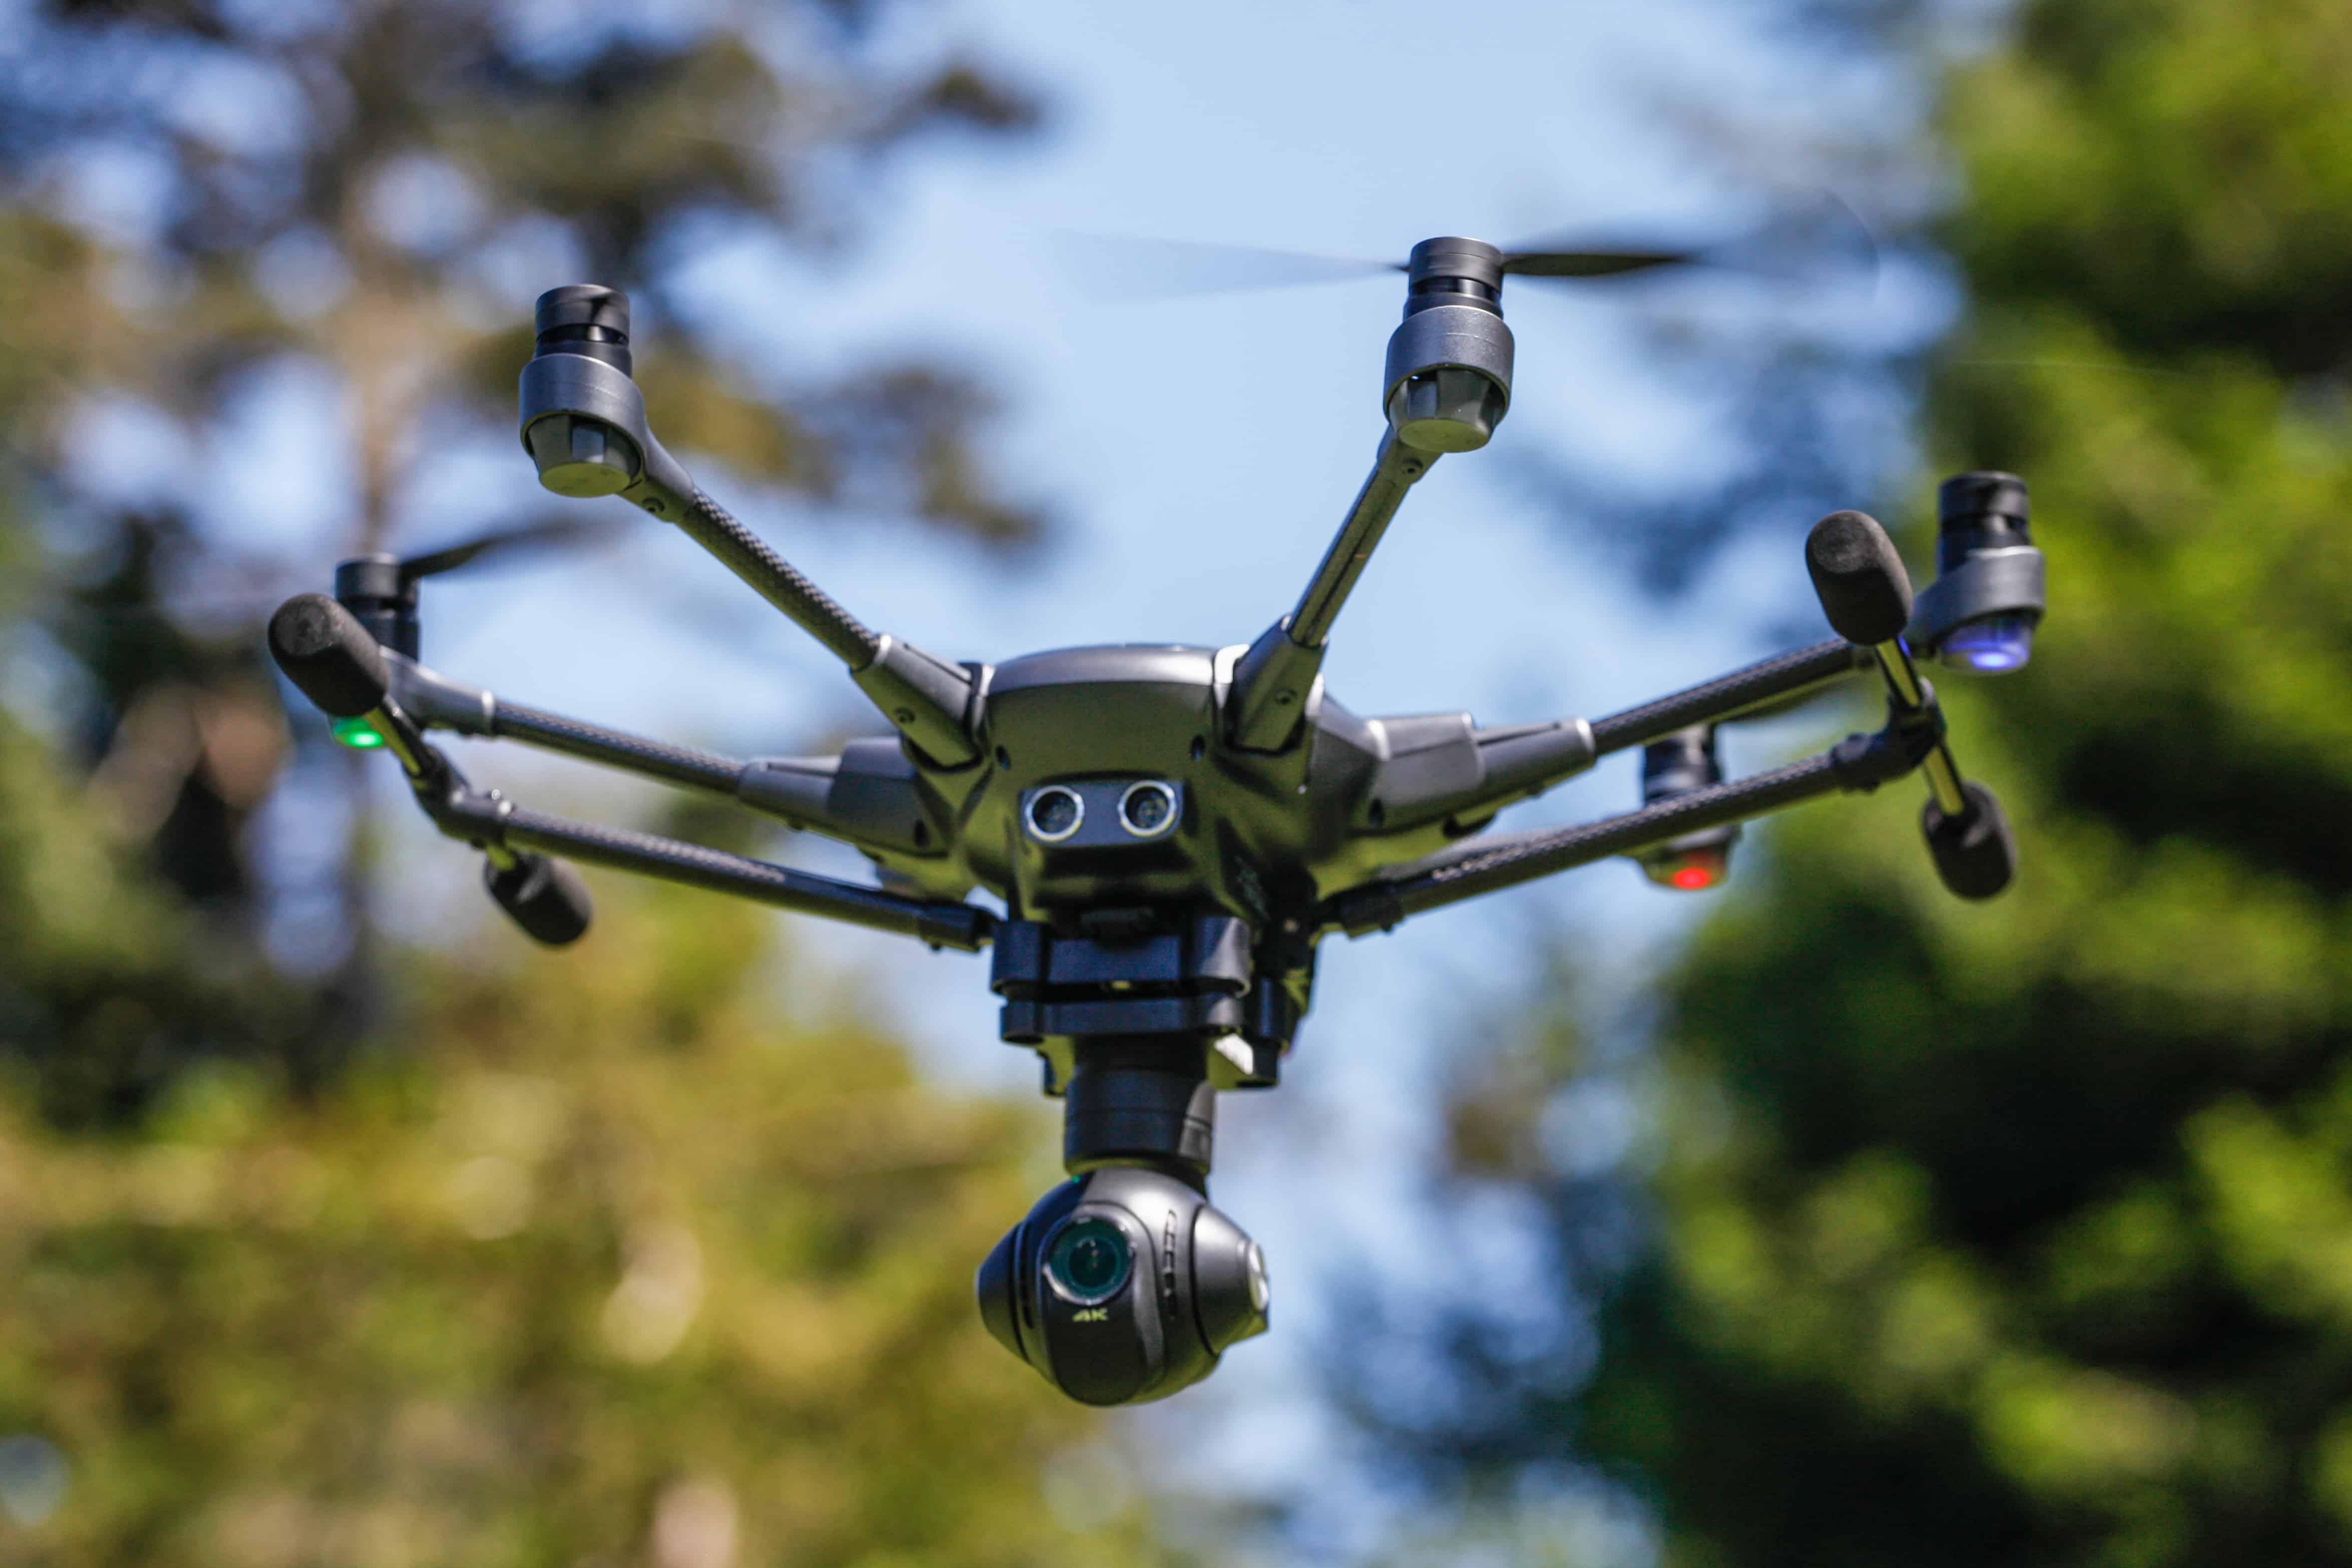 Yuneec Typhoon H Pro – drone